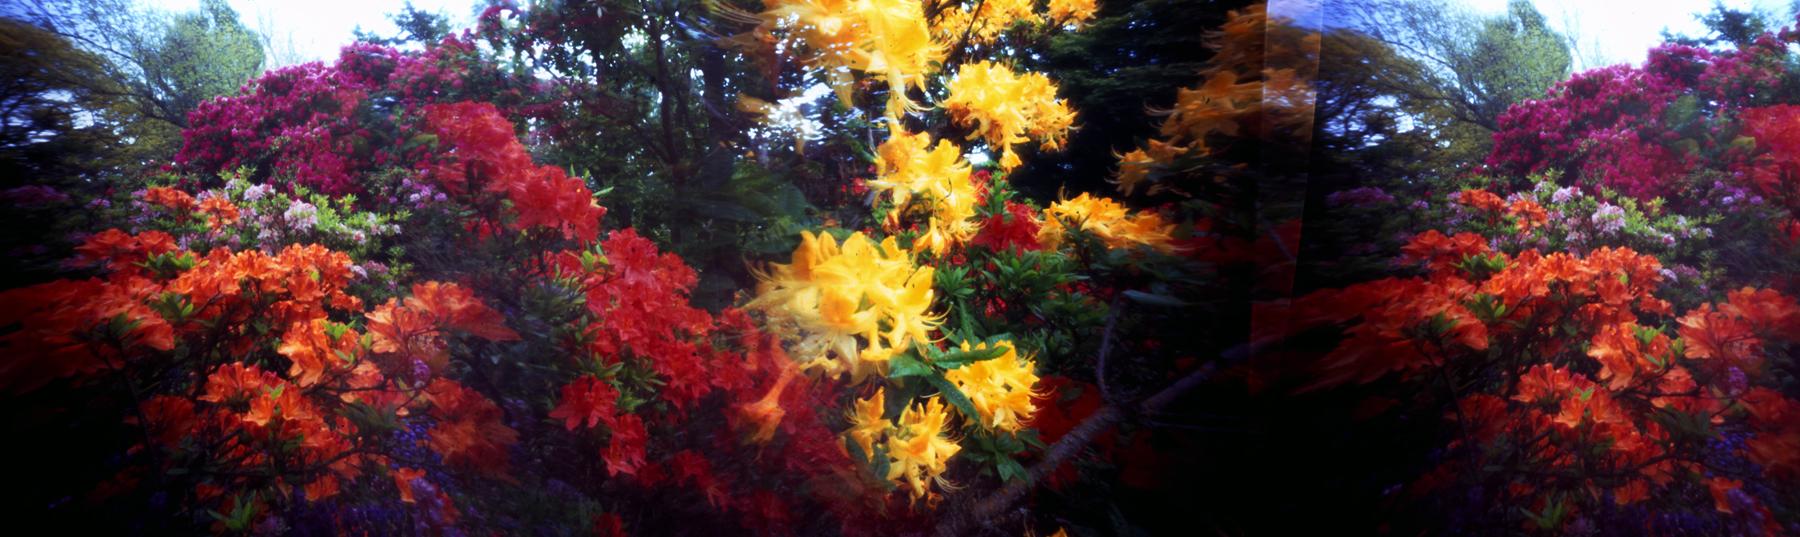 Bob St.Cyr | Cross-Pollination Pinhole-Blender